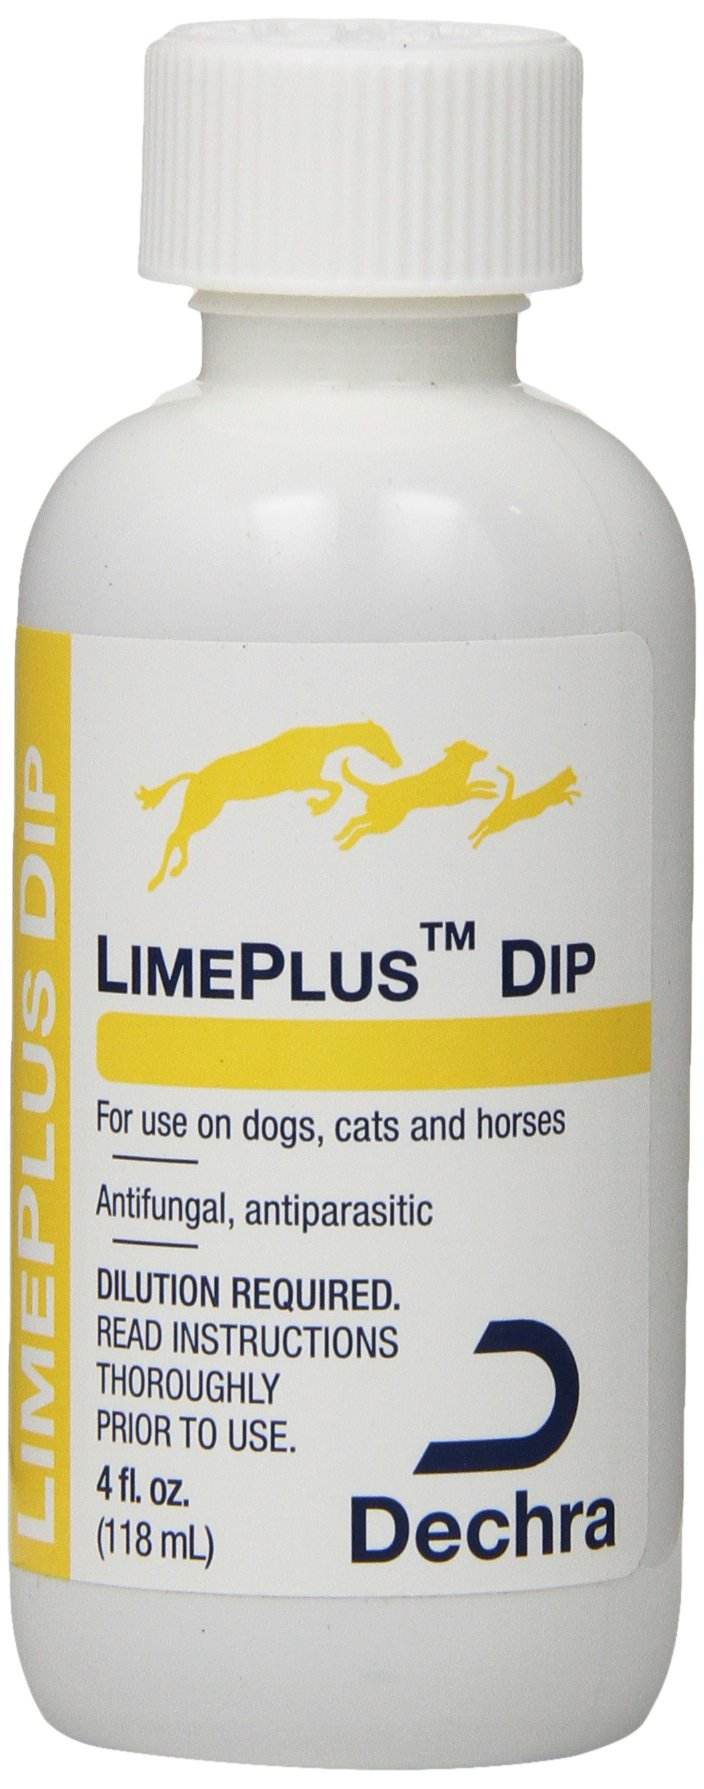 Dechra LimePlus Dip Pest Control Supply, 4-Ounce by Dechra